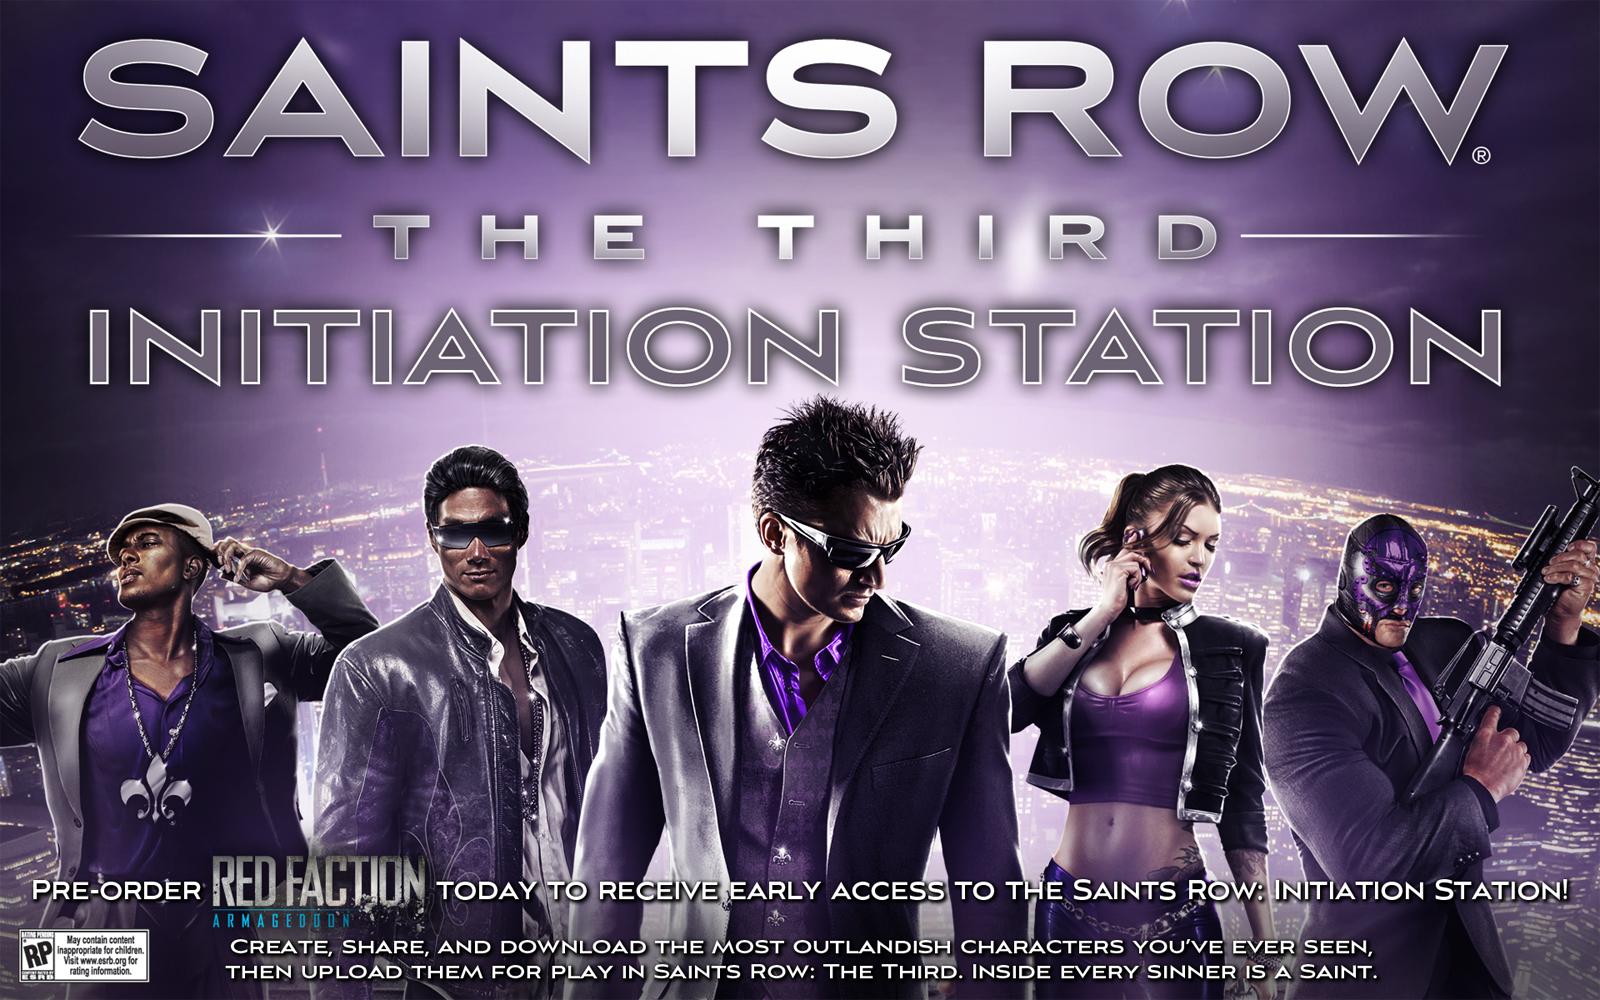 http://3.bp.blogspot.com/-5BXzY2NTro4/Ts25b554EmI/AAAAAAAALaQ/wYeomWzaN-w/s1600/Saints+Row+-+The+Third+Game+Wallpaper.jpg